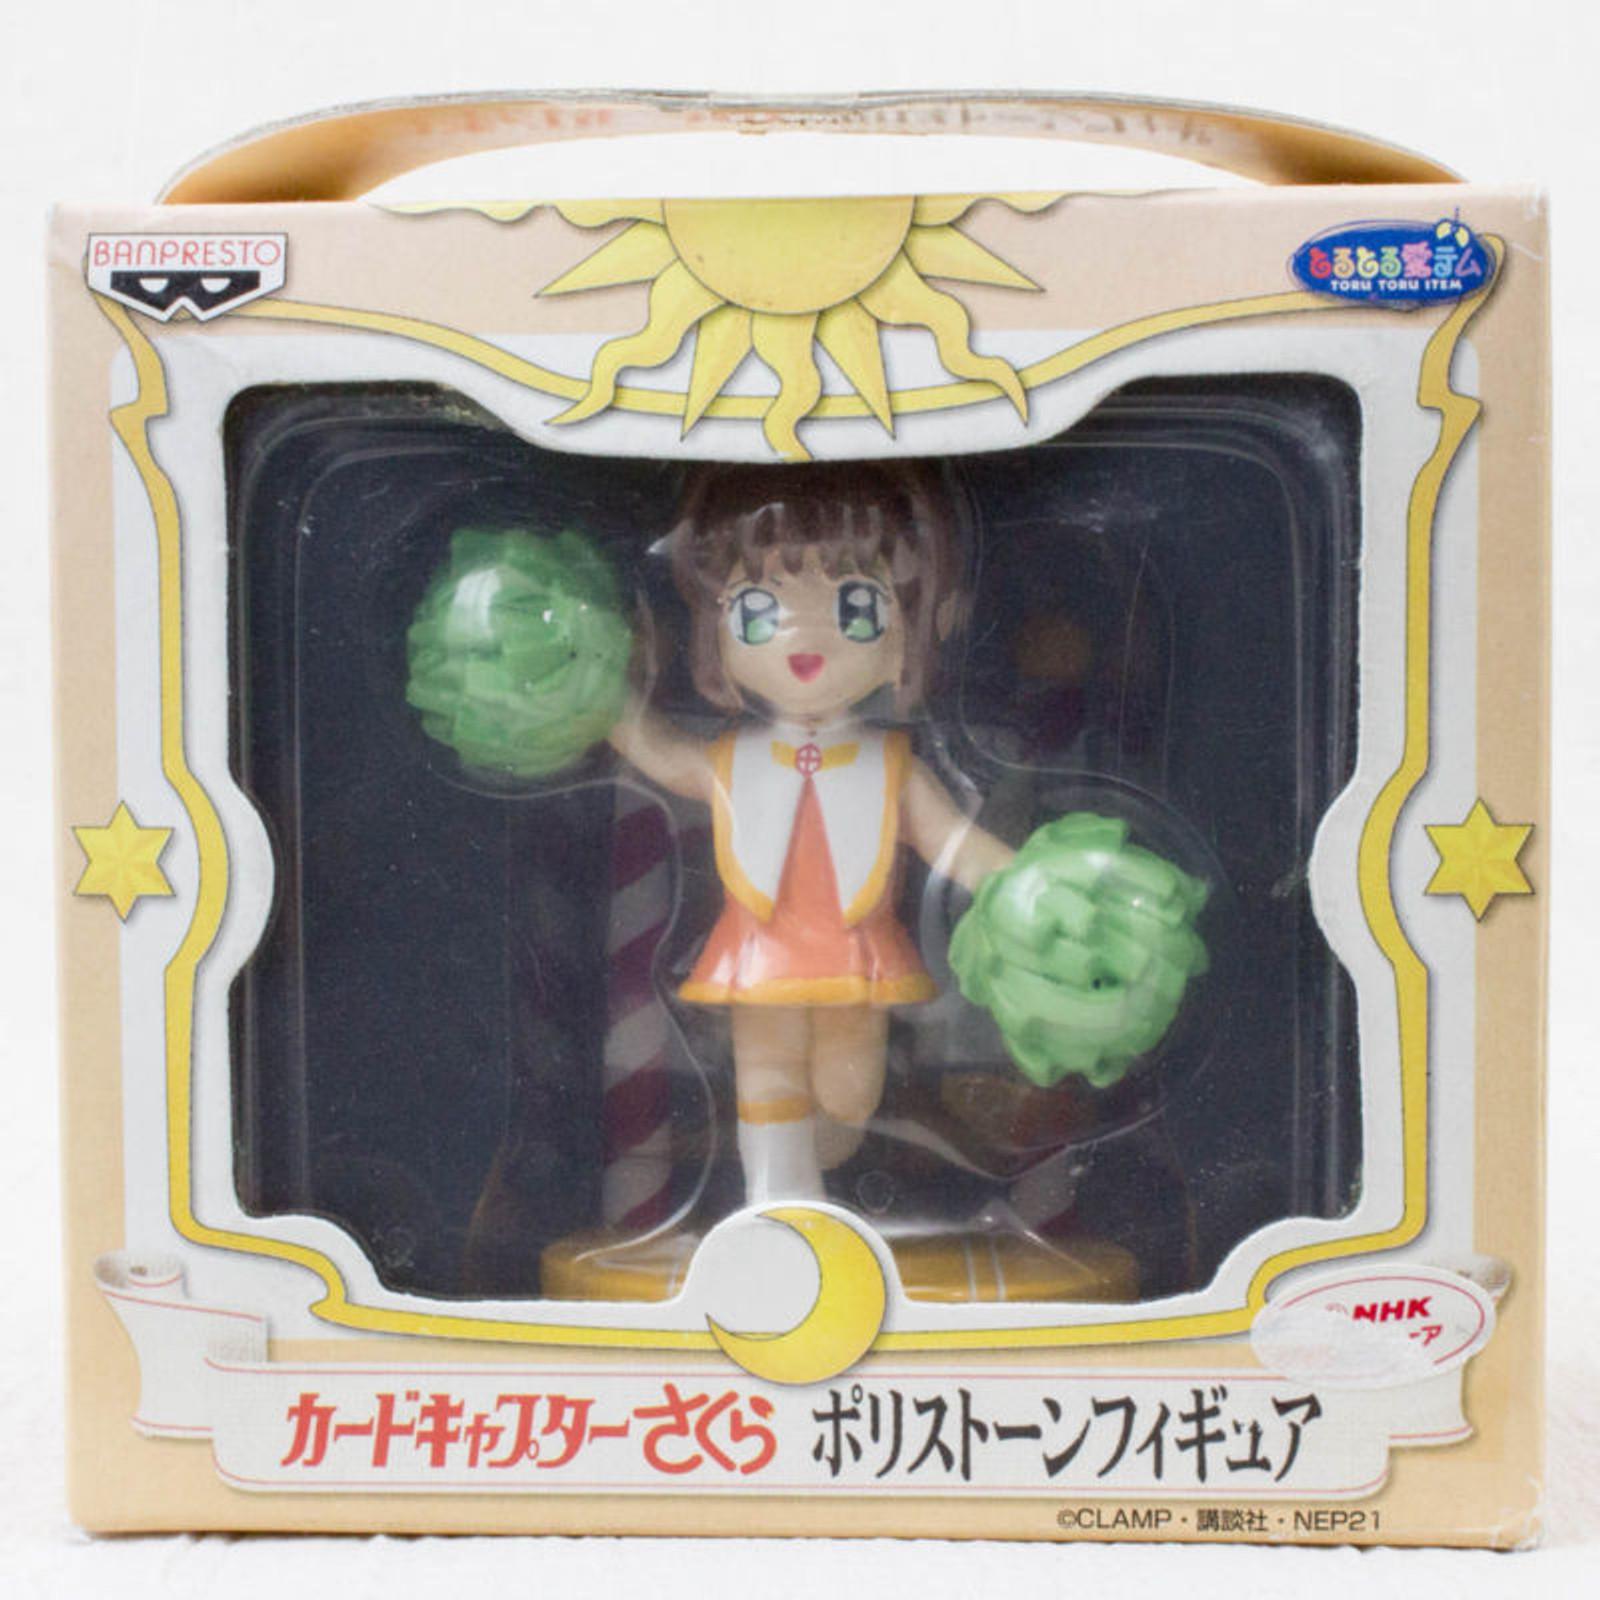 Cardcaptor Sakura Polystone Figure Cheerleader Ver. CLAMP JAPAN ANIME MANGA